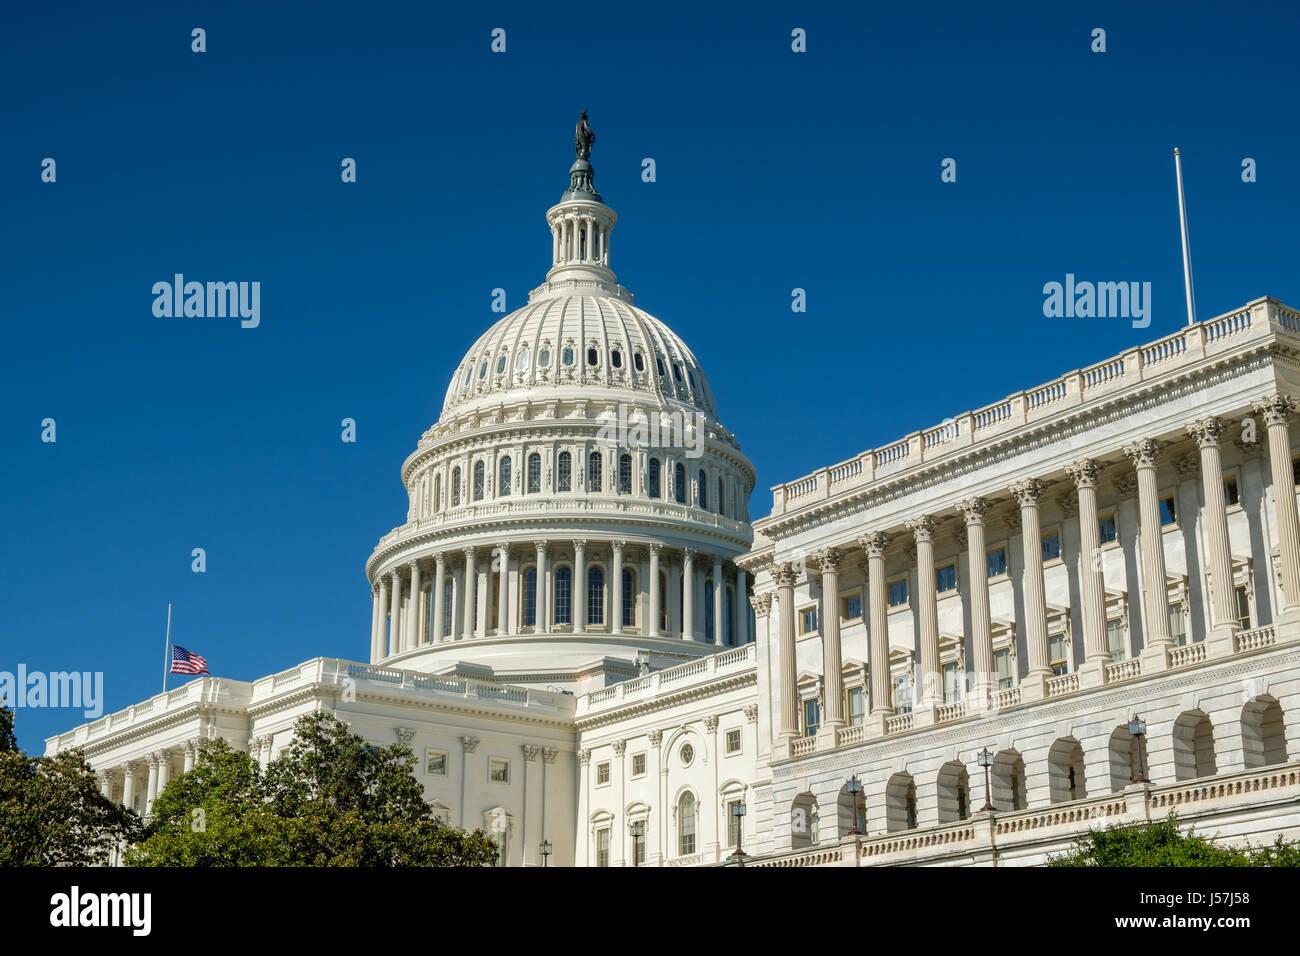 U.S. Capitol with Blue Sky, Washington, DC - Stock Image